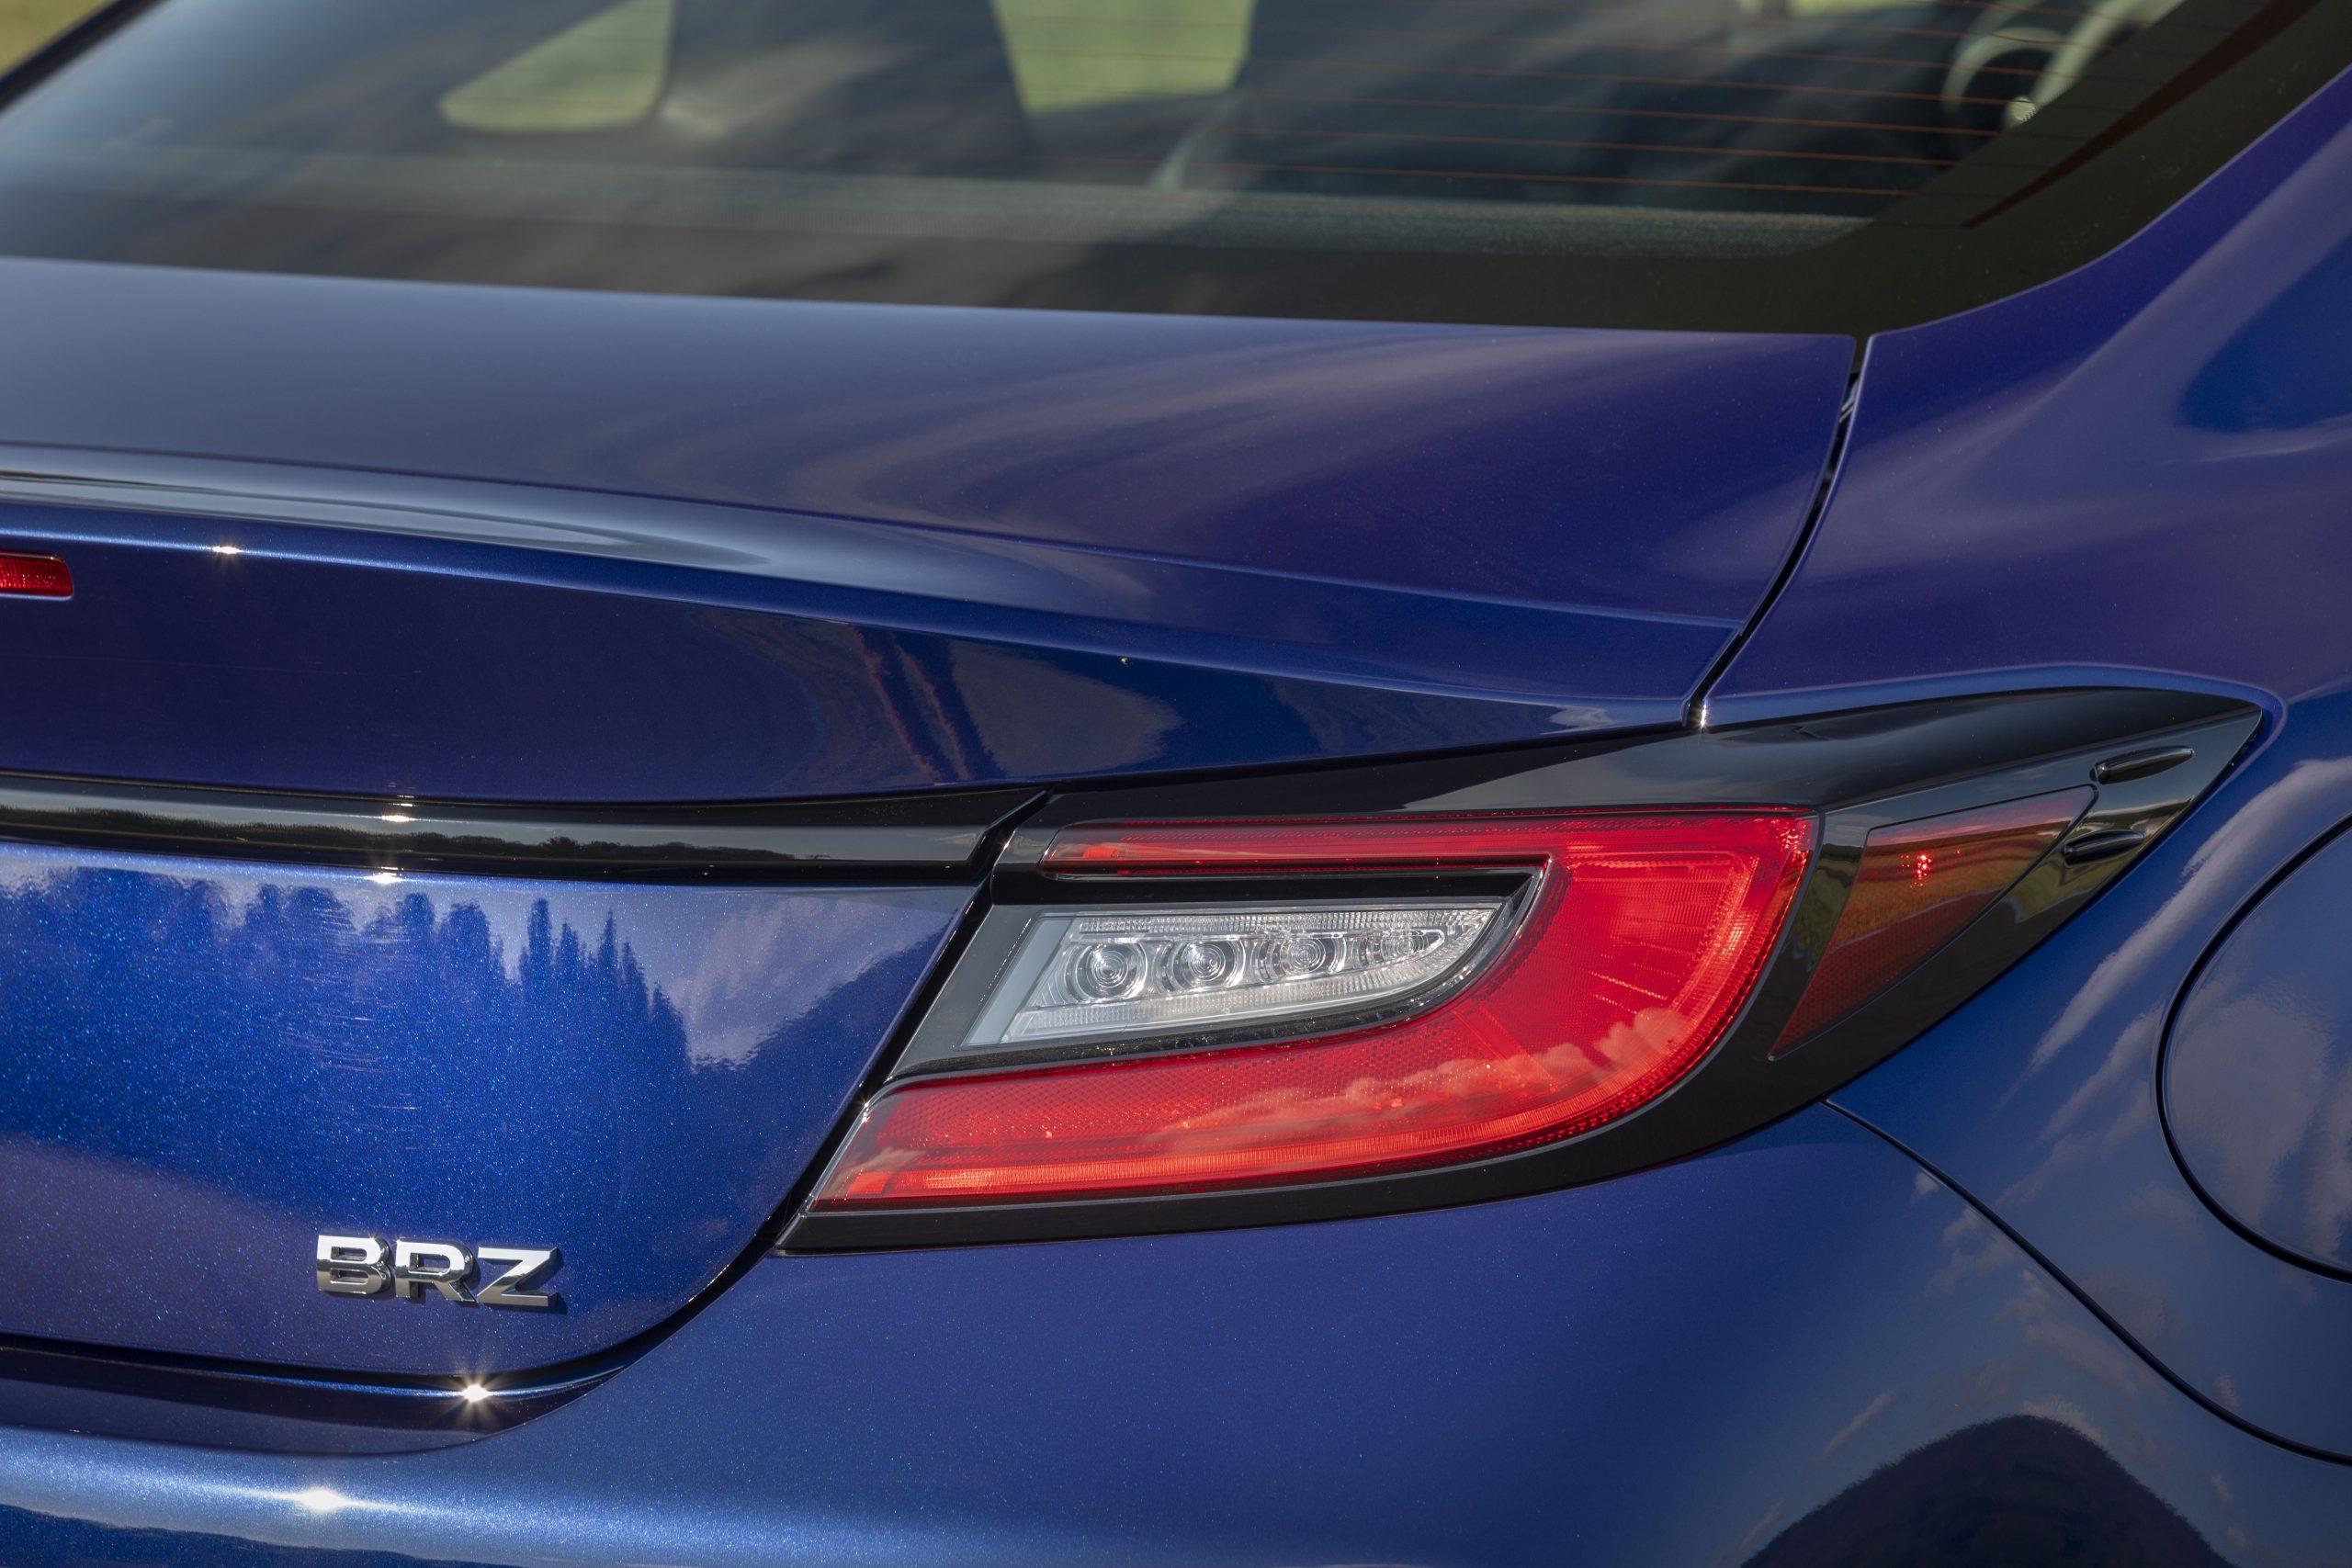 2022 Subaru BRZ rear taillight